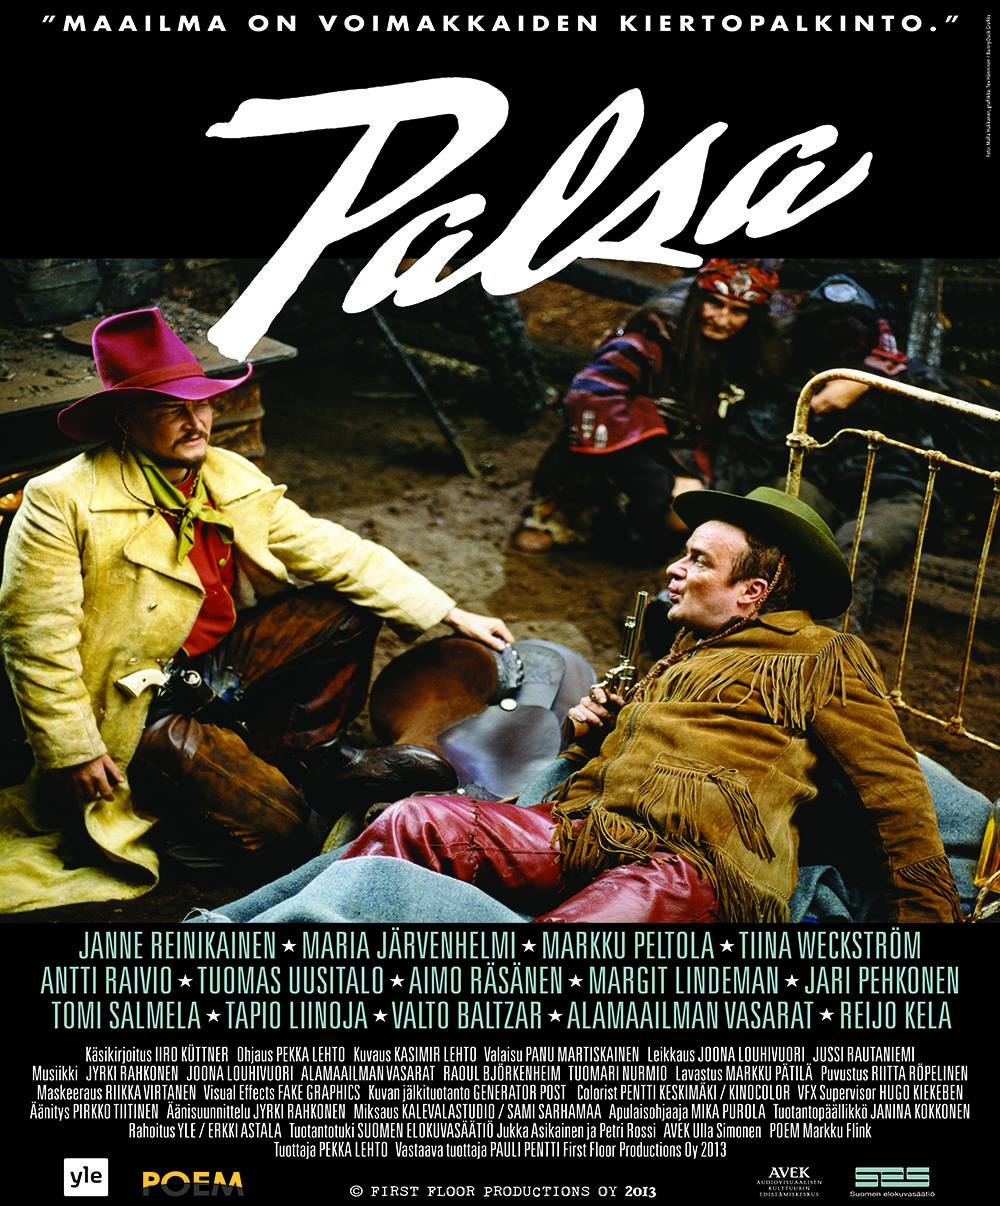 Palsa – The Surrealist  Dir. Pekka Lehto Co-Edited with Joona Louhivuori First Floor Productions / 2014